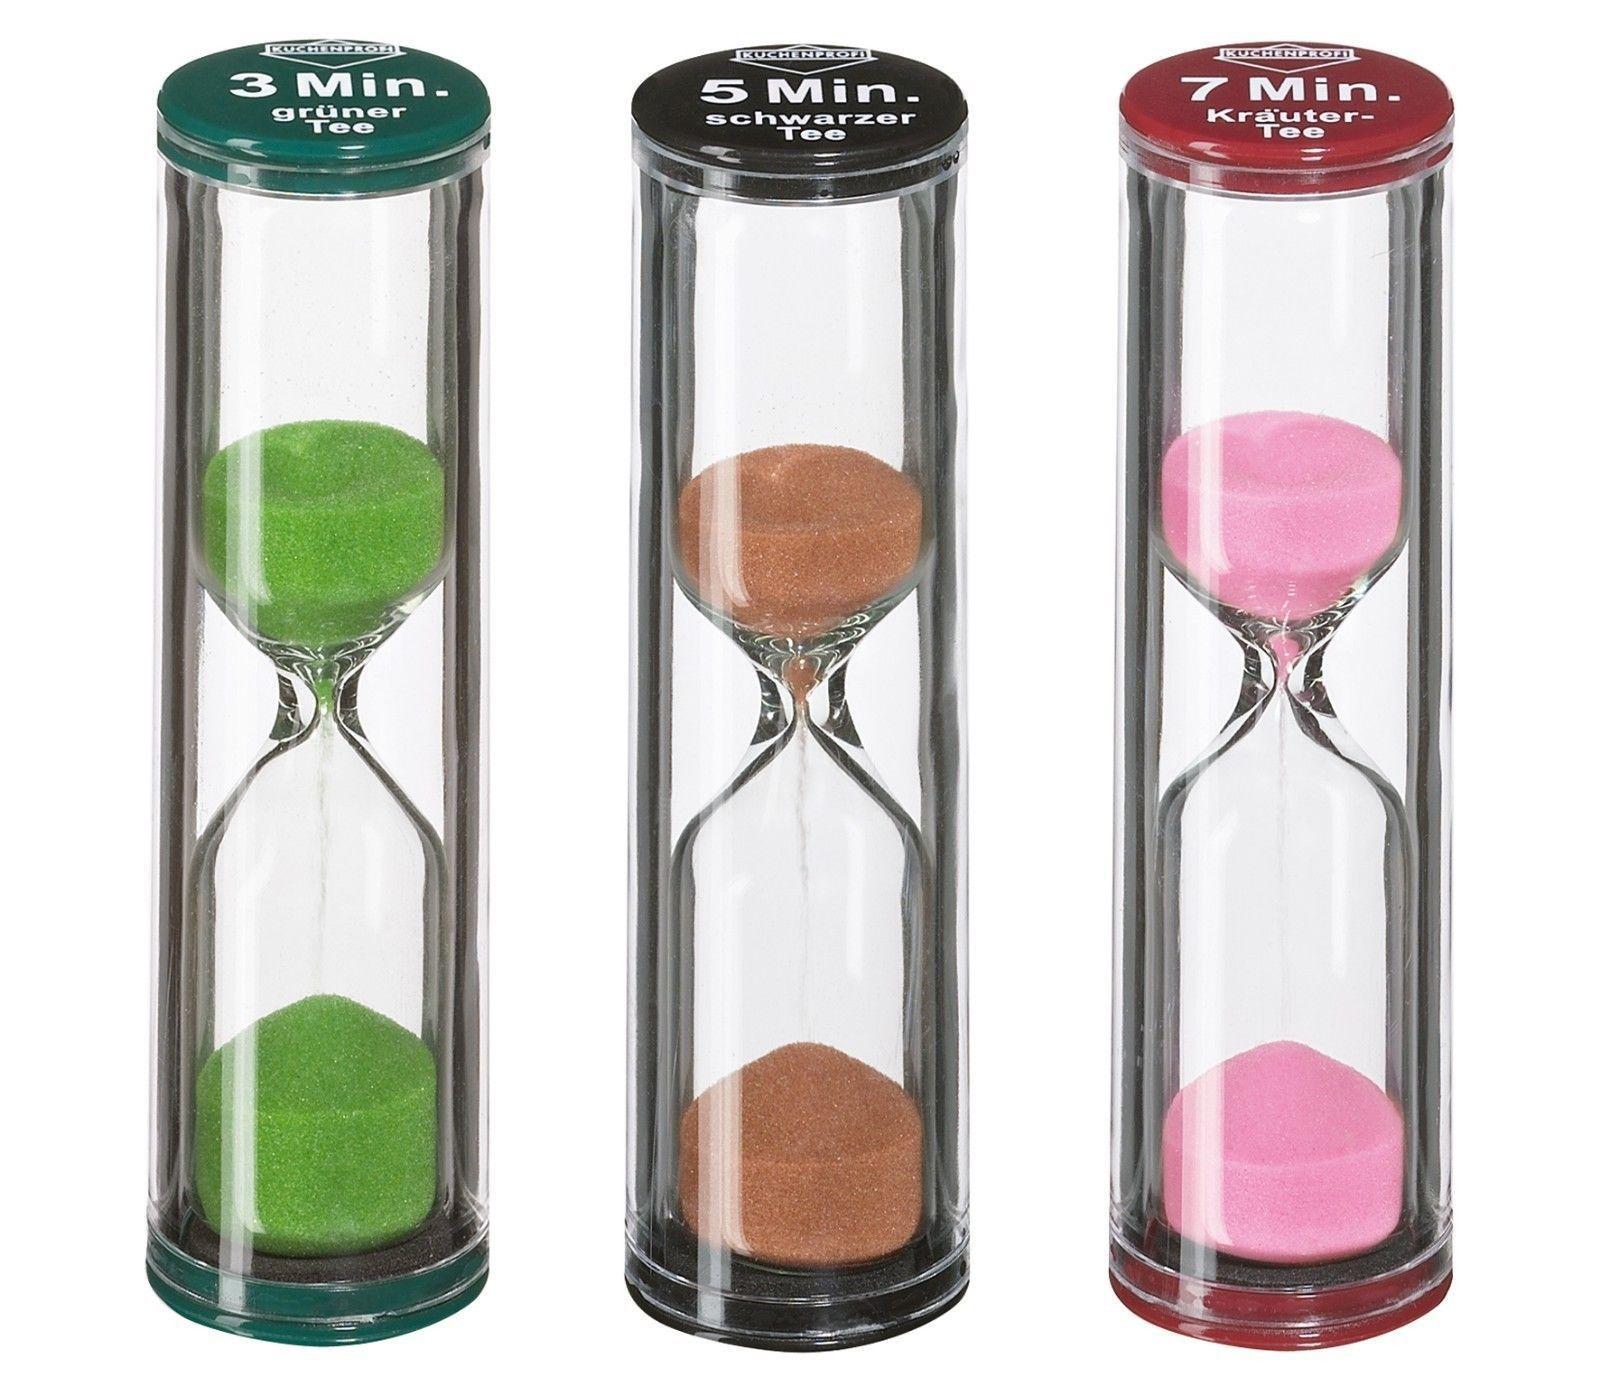 kuchenprofi 3 5 7 minute tea egg sand timers assorted set of 3 100926